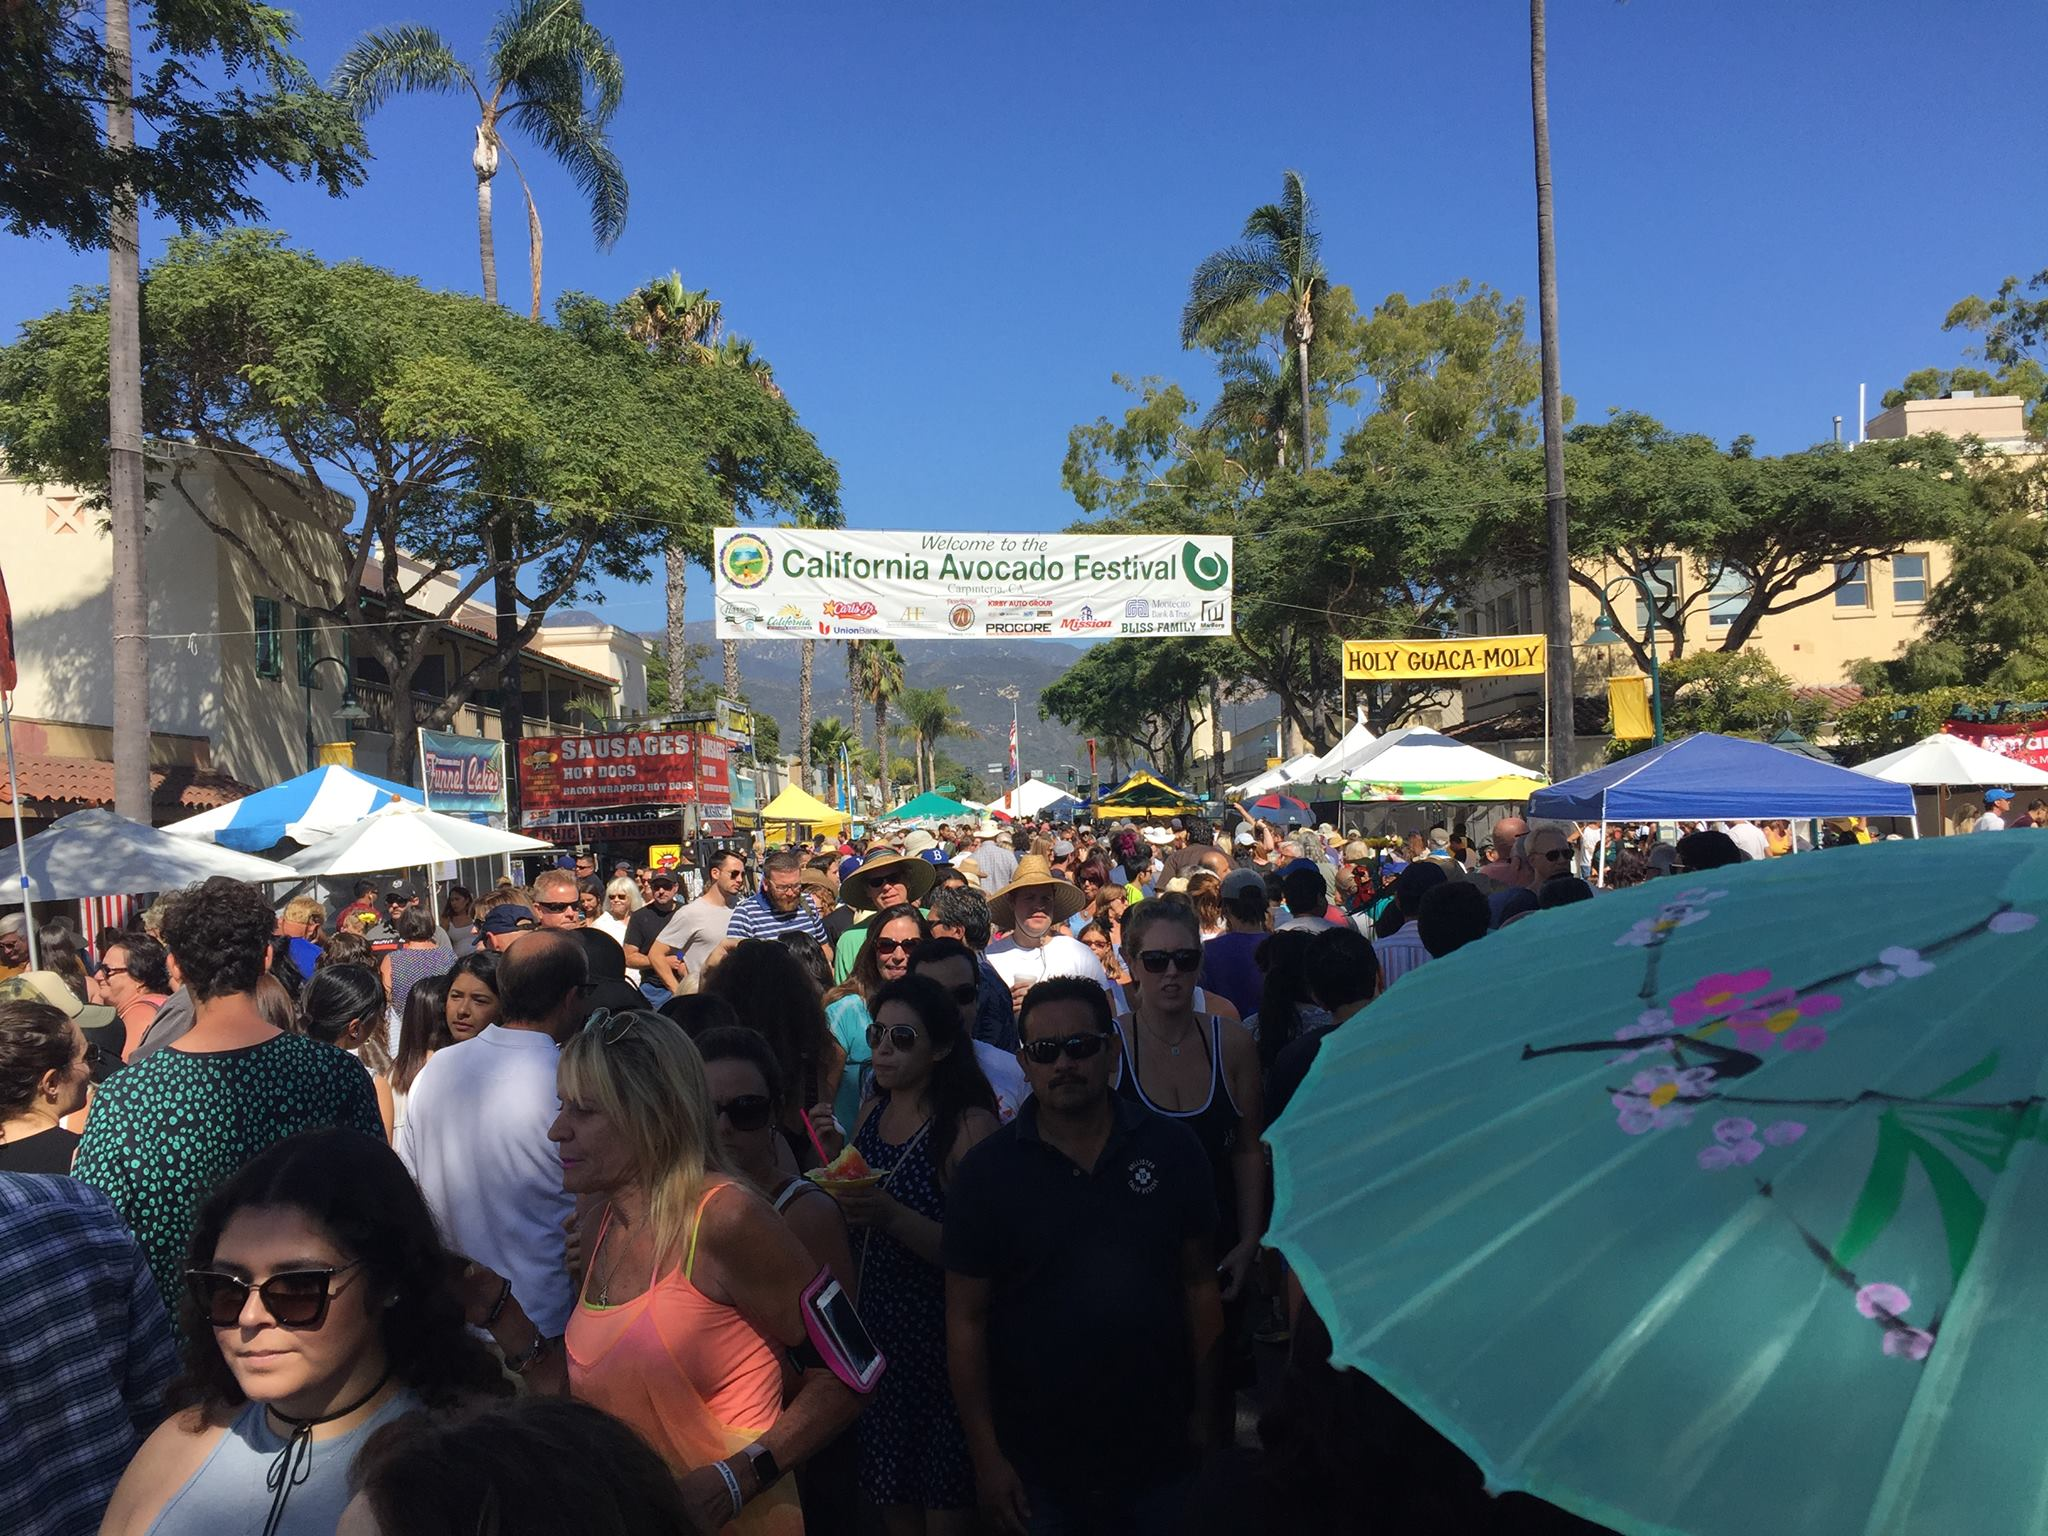 2019 California Avocado Festival